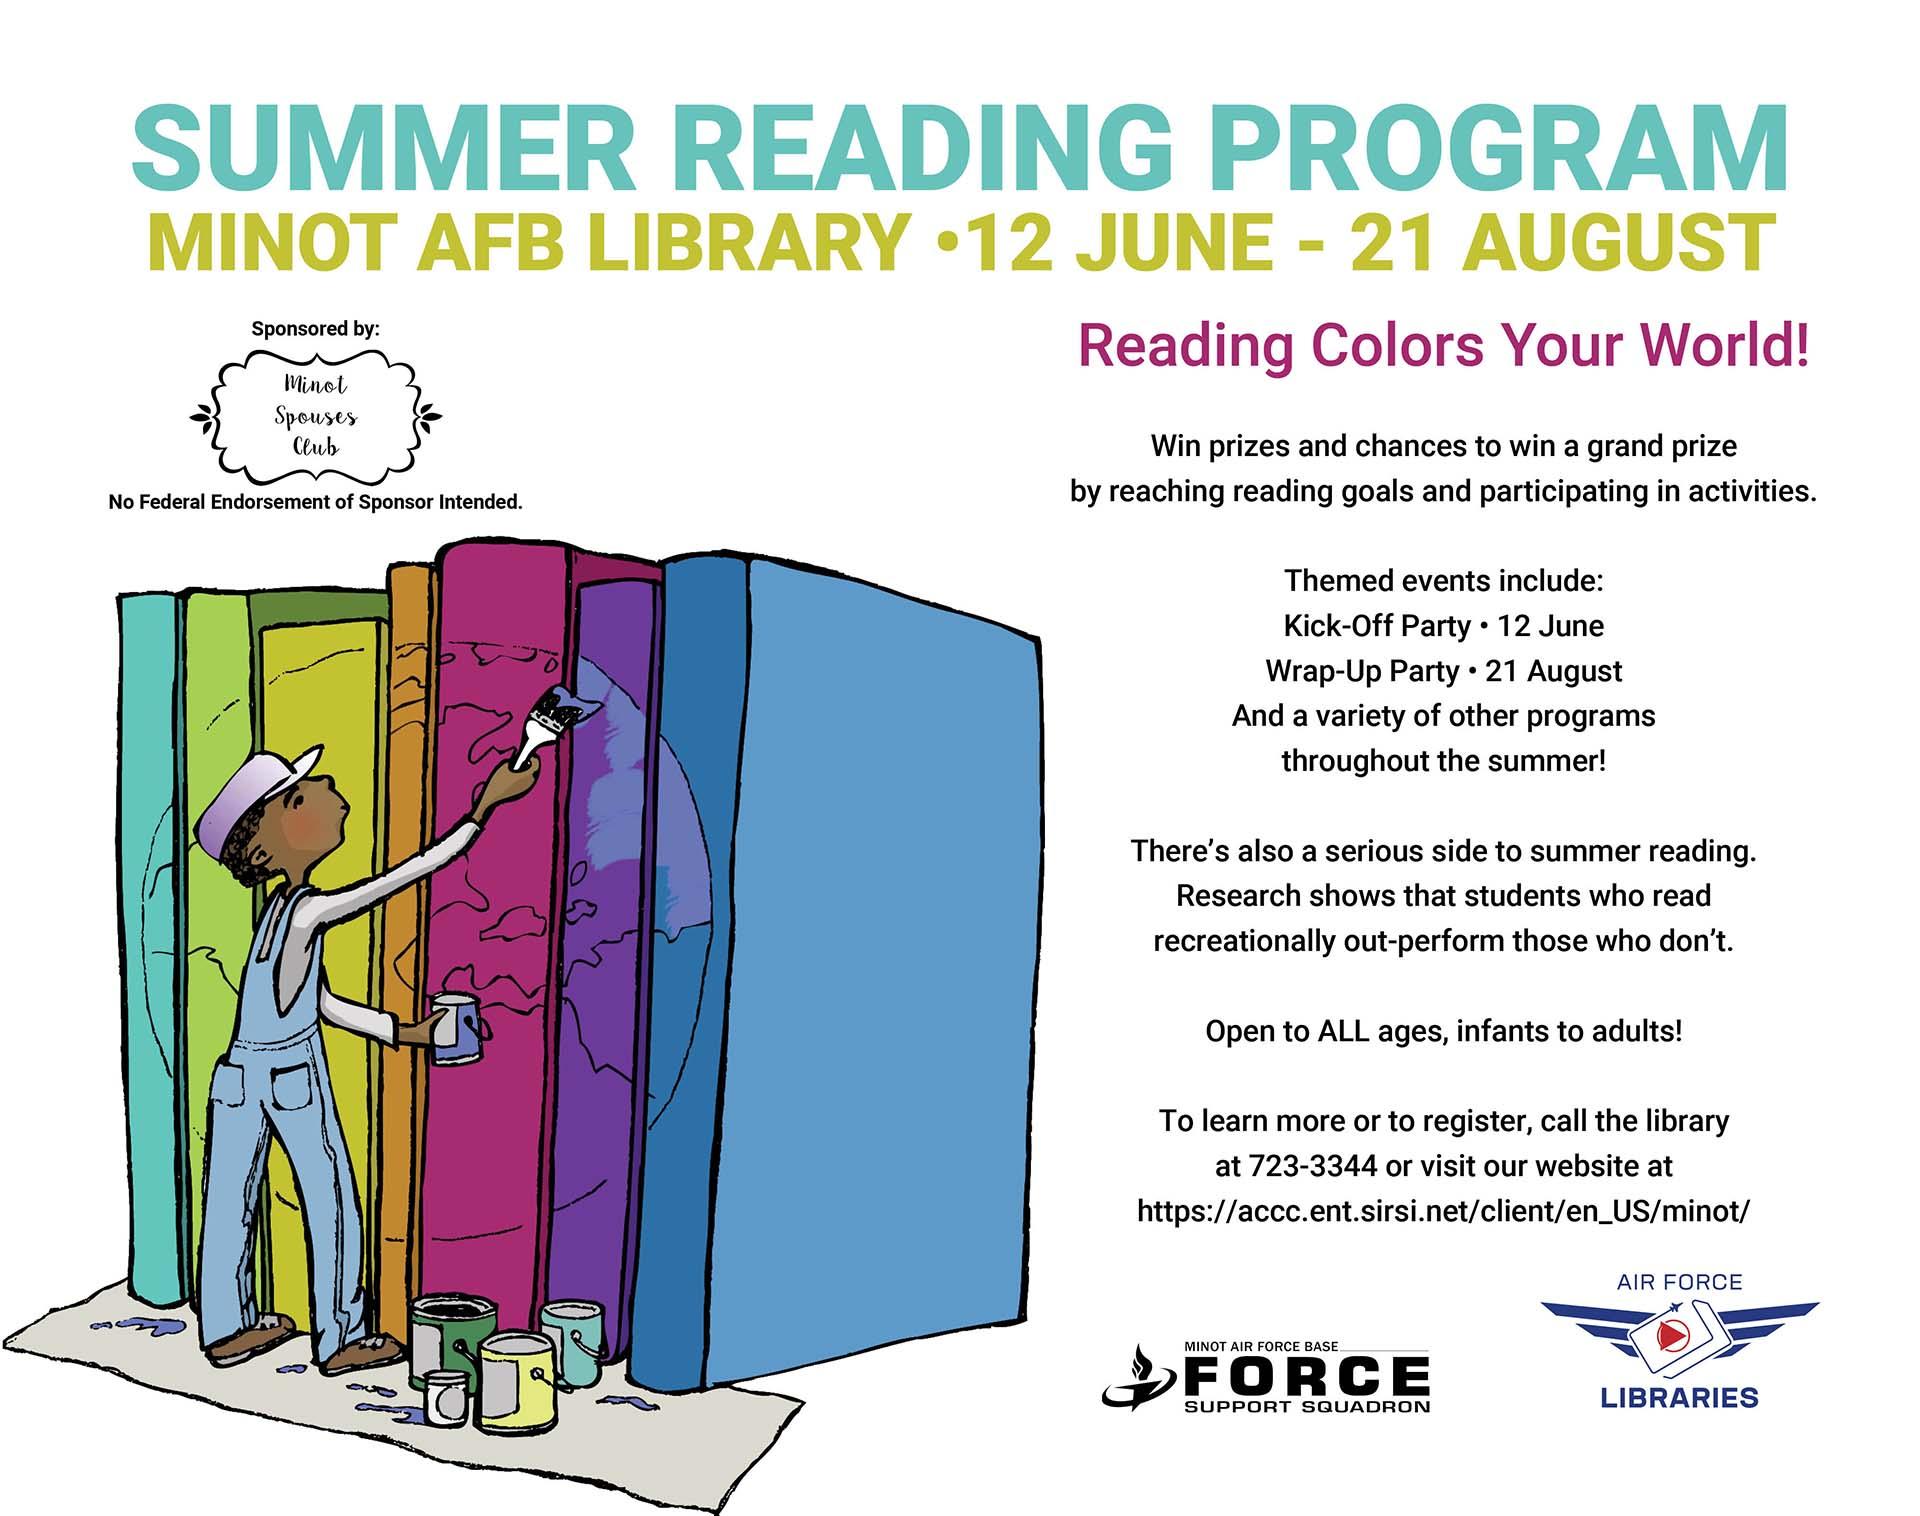 Summer Reading Program Ends